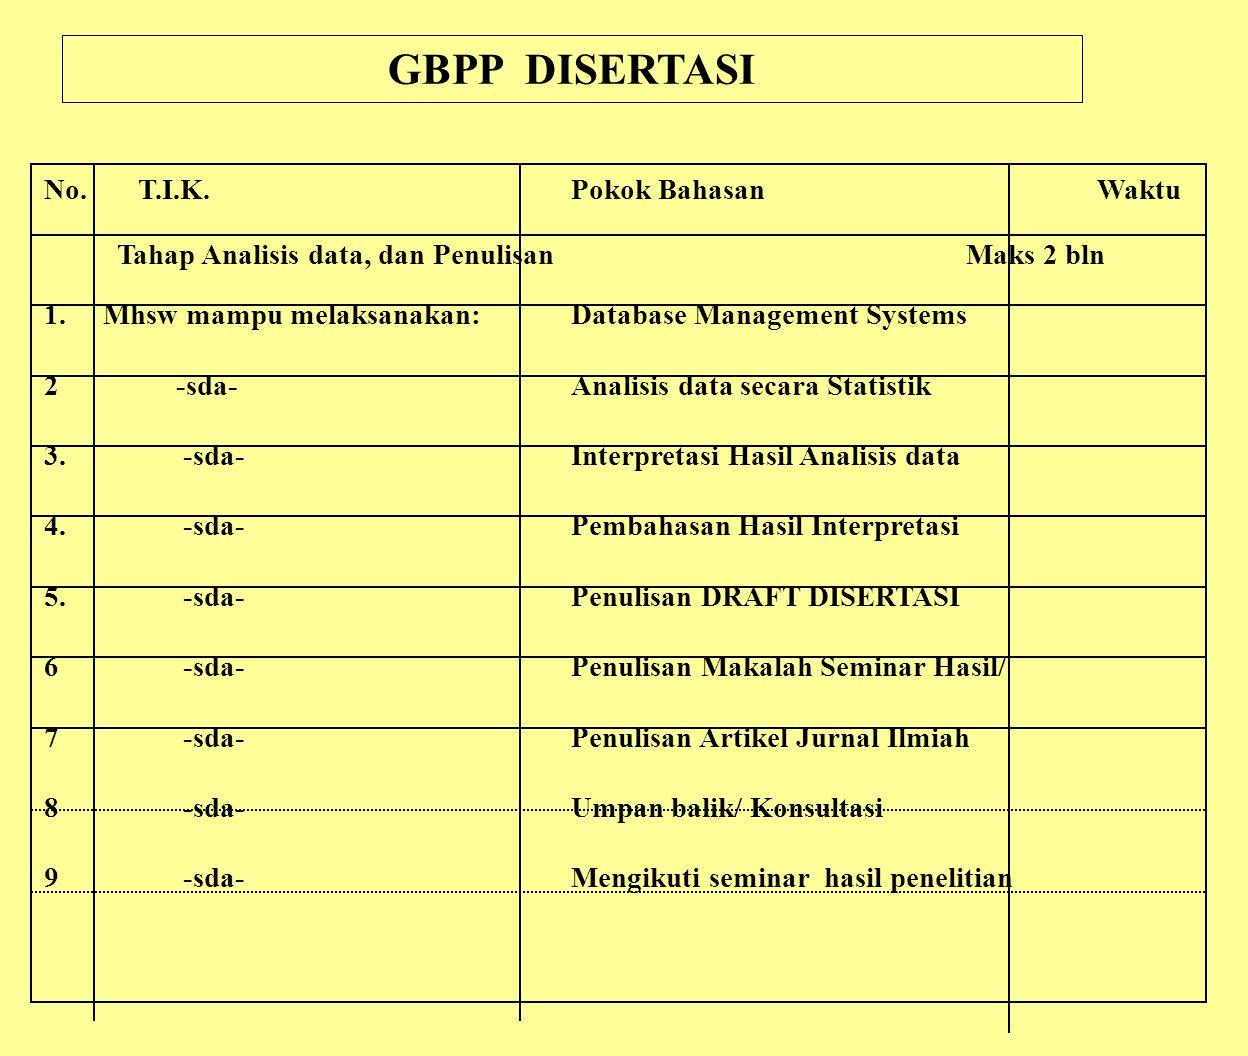 GBPP DISERTASI No. T.I.K. Pokok Bahasan Waktu Tahap Analisis data, dan Penulisan Maks 2 bln 1. Mhsw mampu melaksanakan:Database Management Systems 2-s